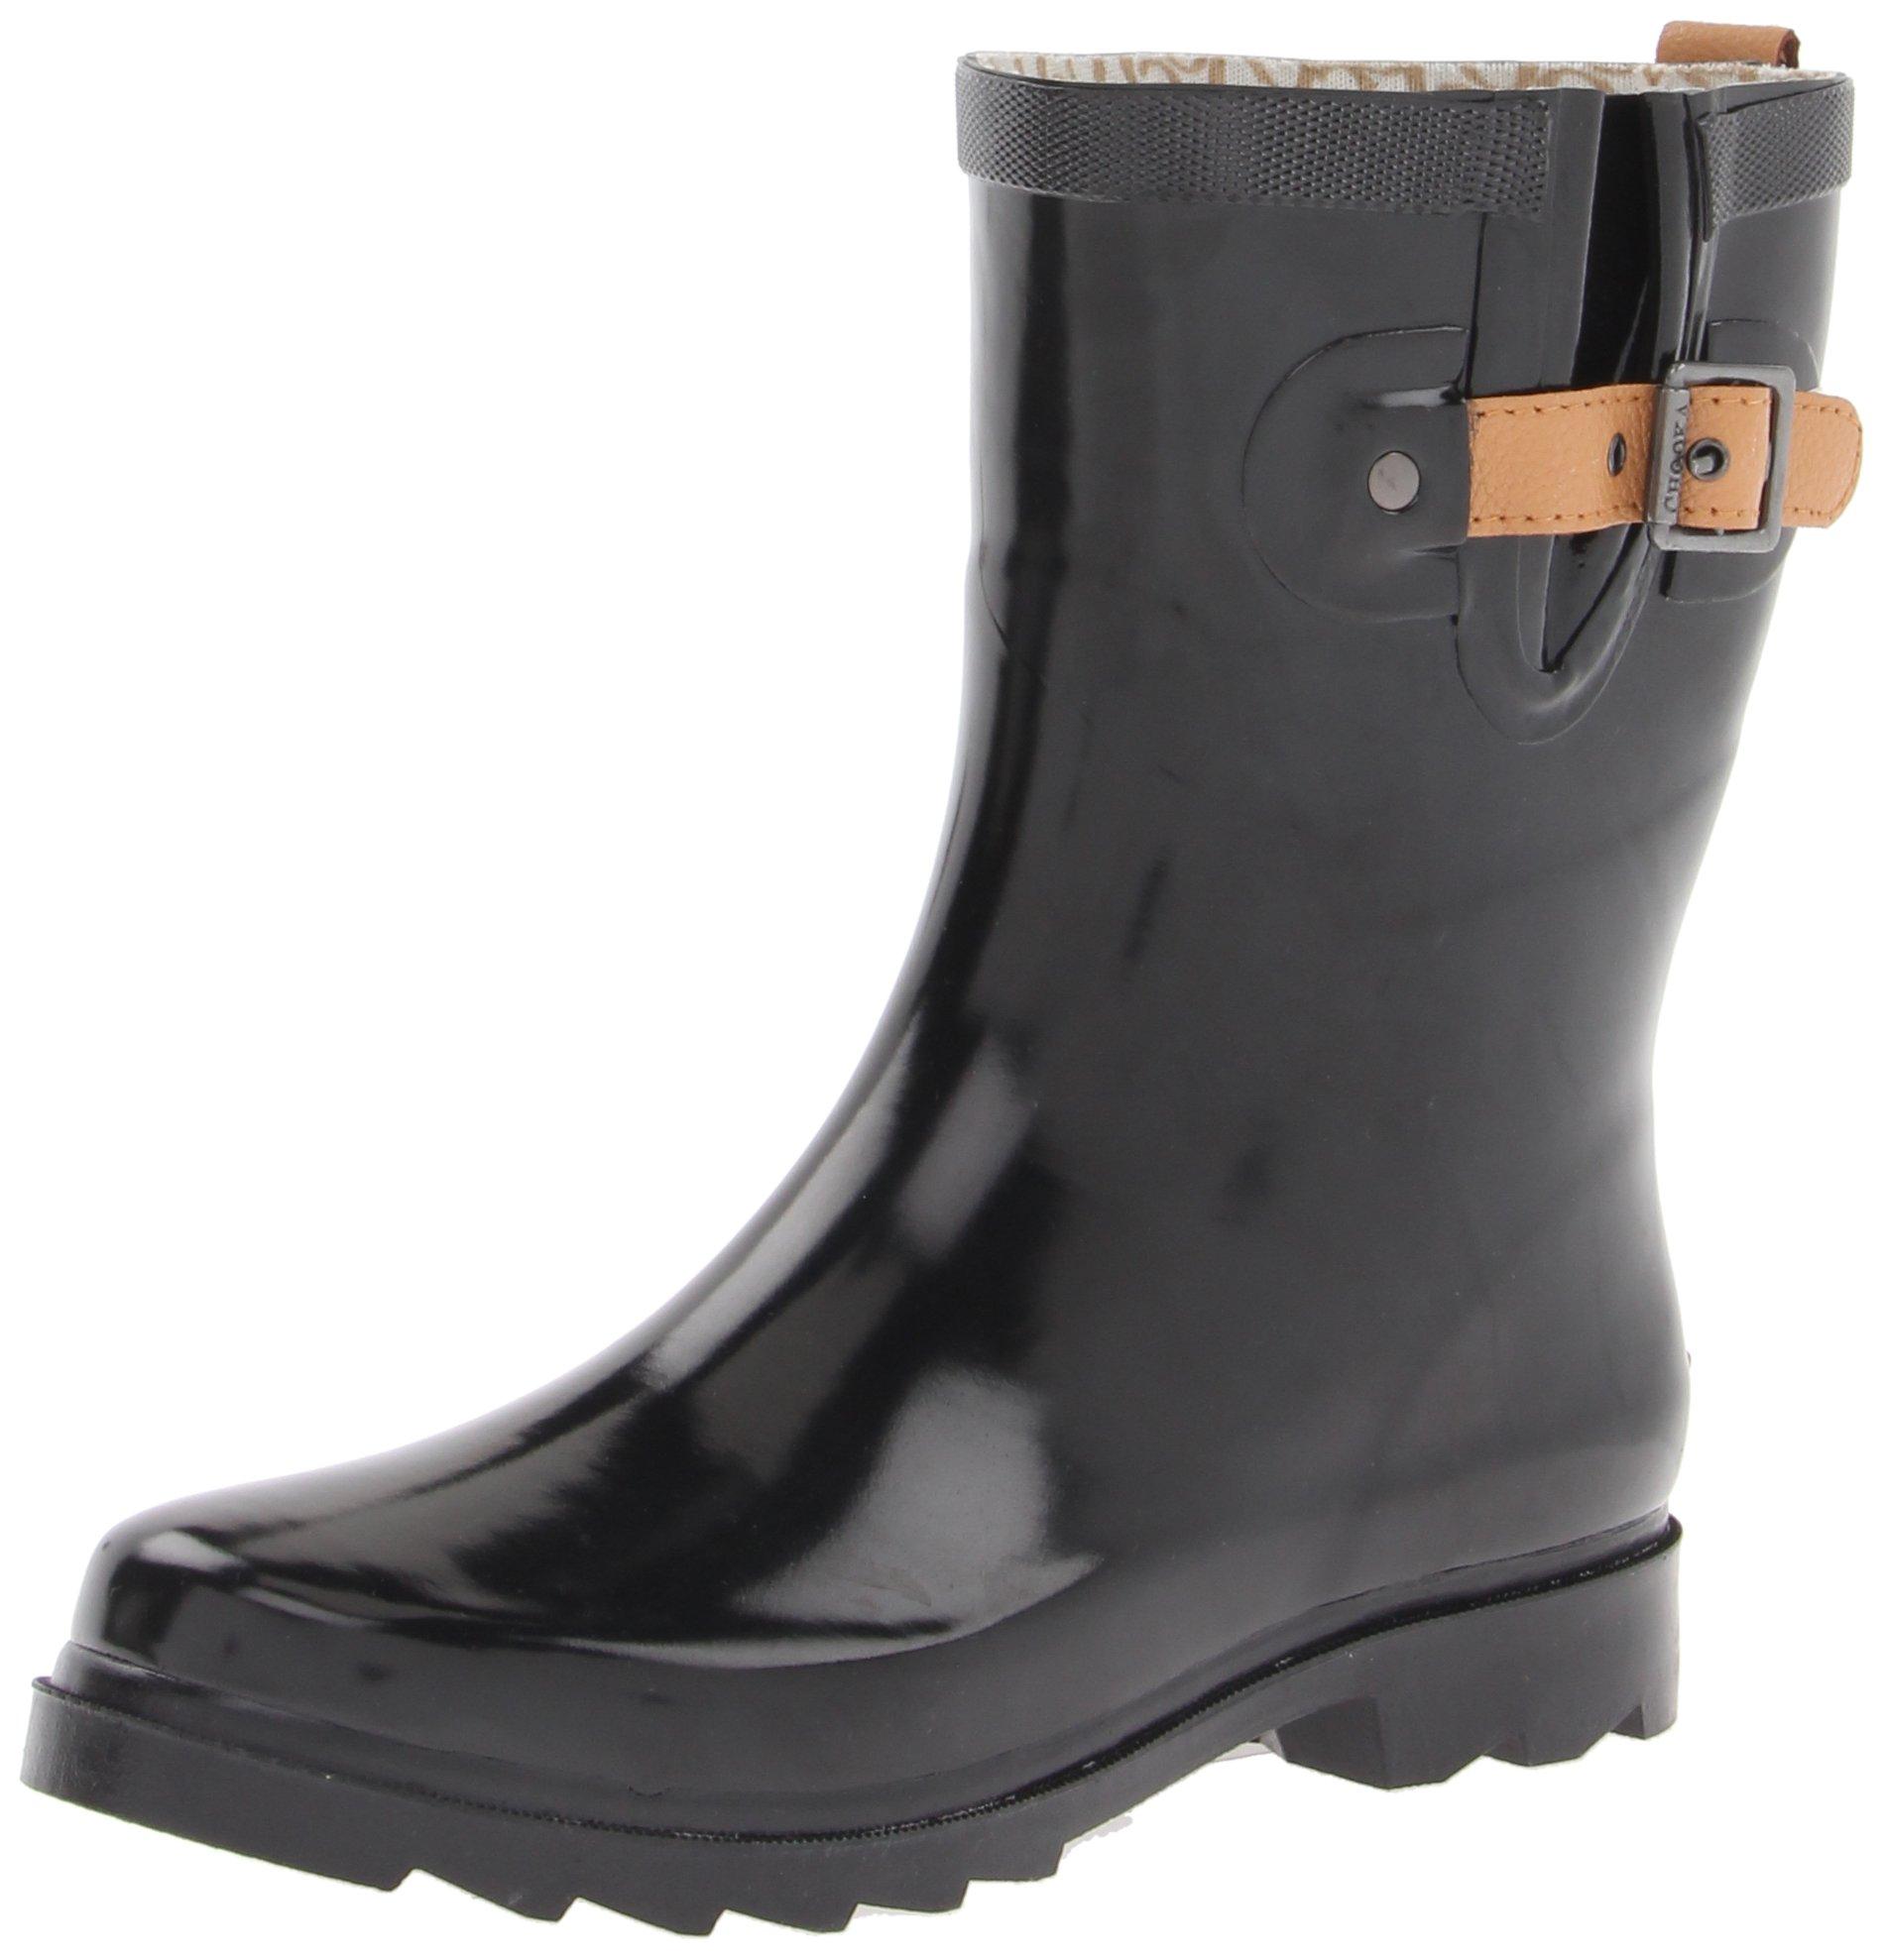 Chooka Women's Mid-Height Rain Boot, Black/Shiny, 7 M US